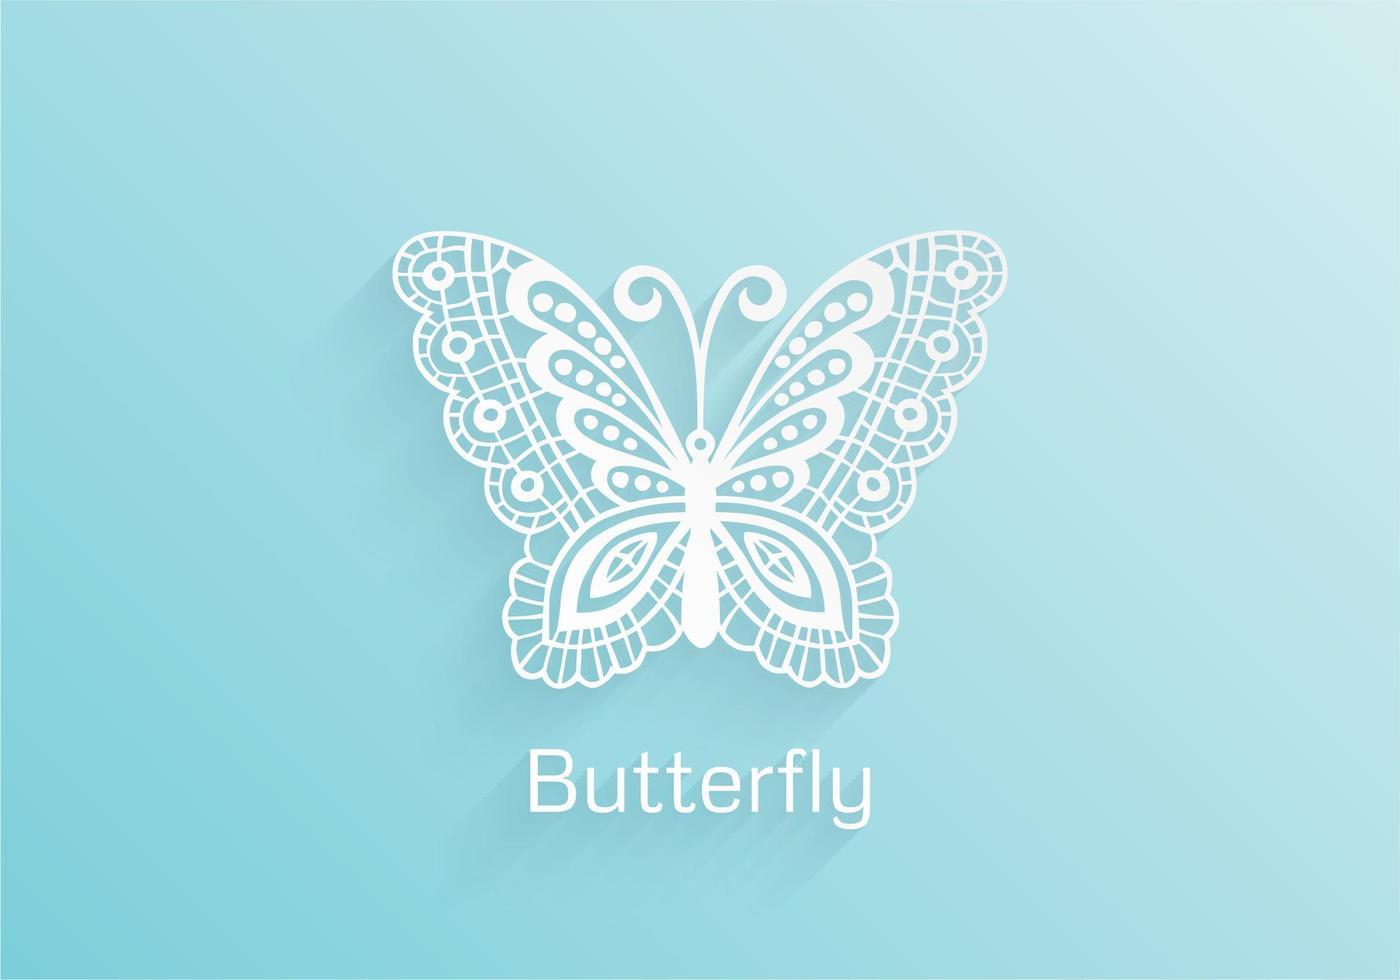 Papel libre de mariposa de encaje Vector